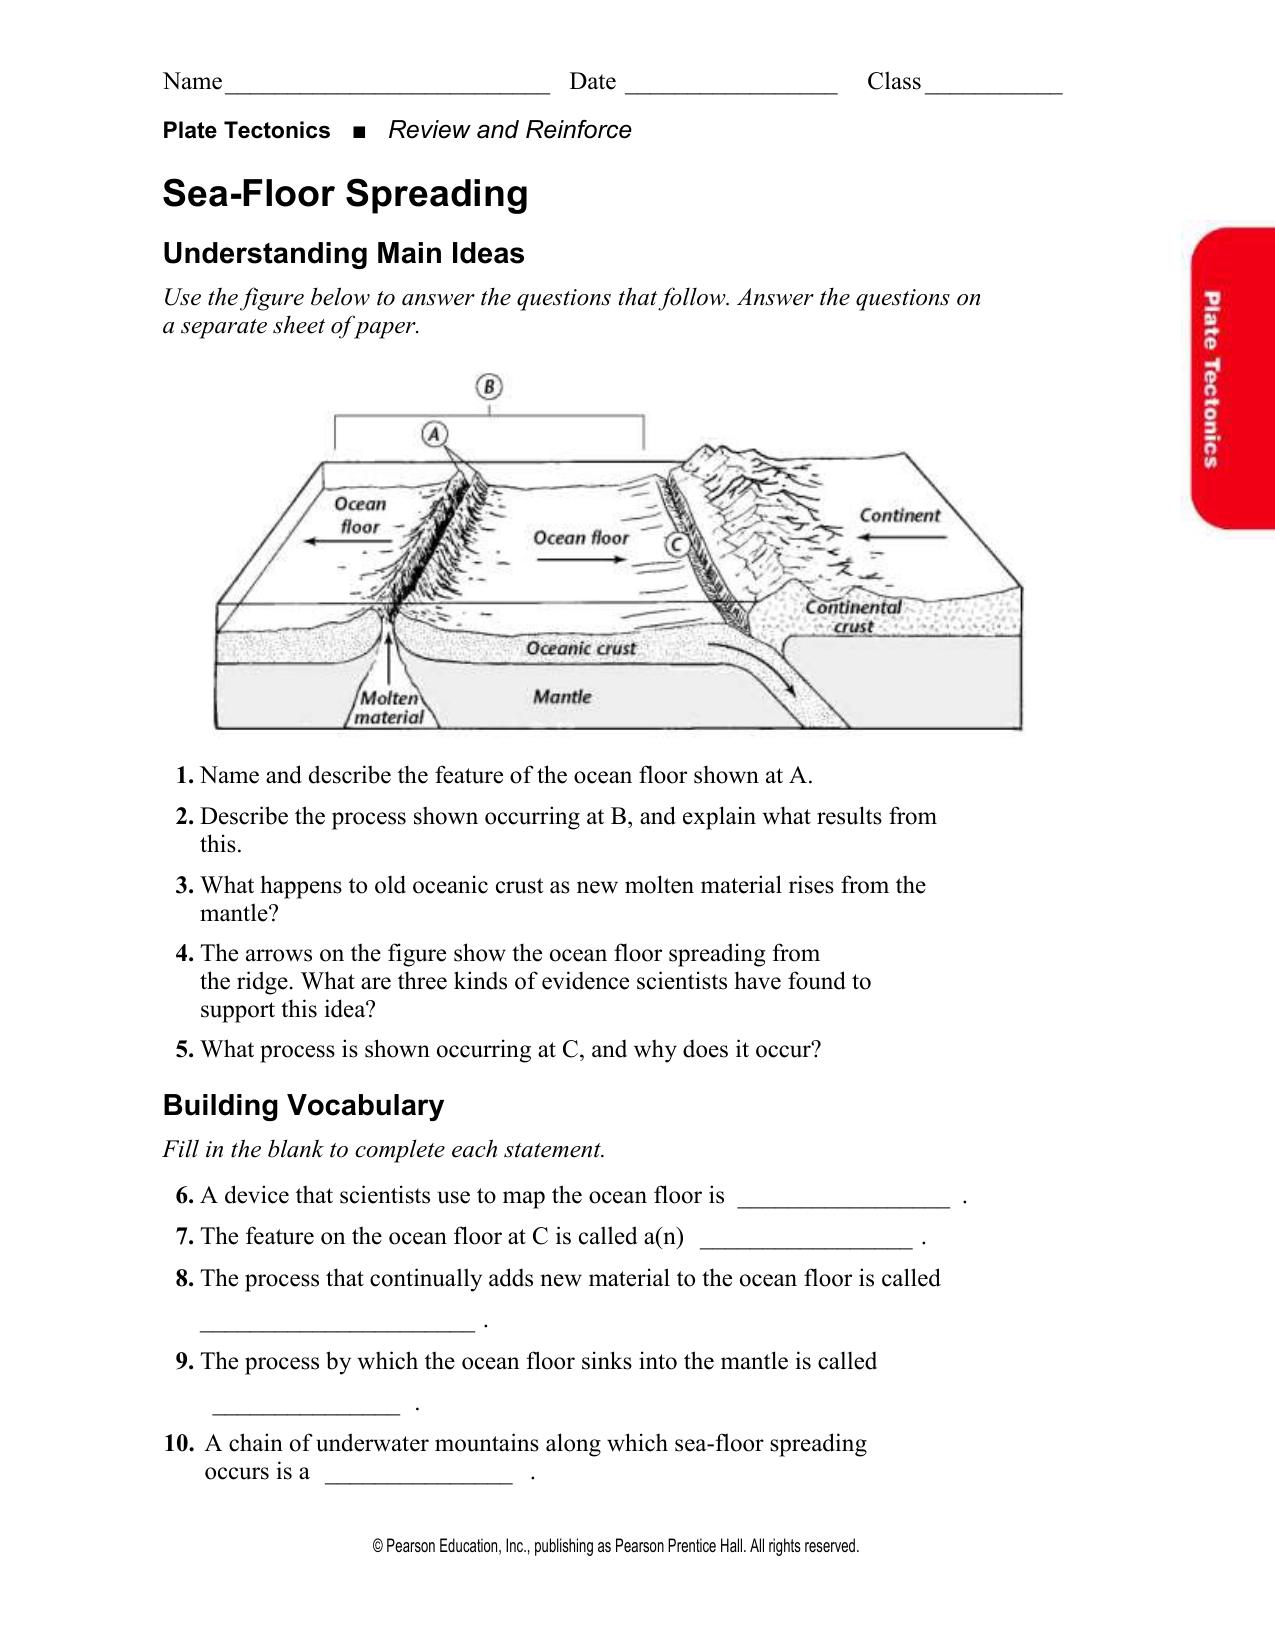 8 Pics Sea Floor Spreading Worksheet Answer Key Pearson